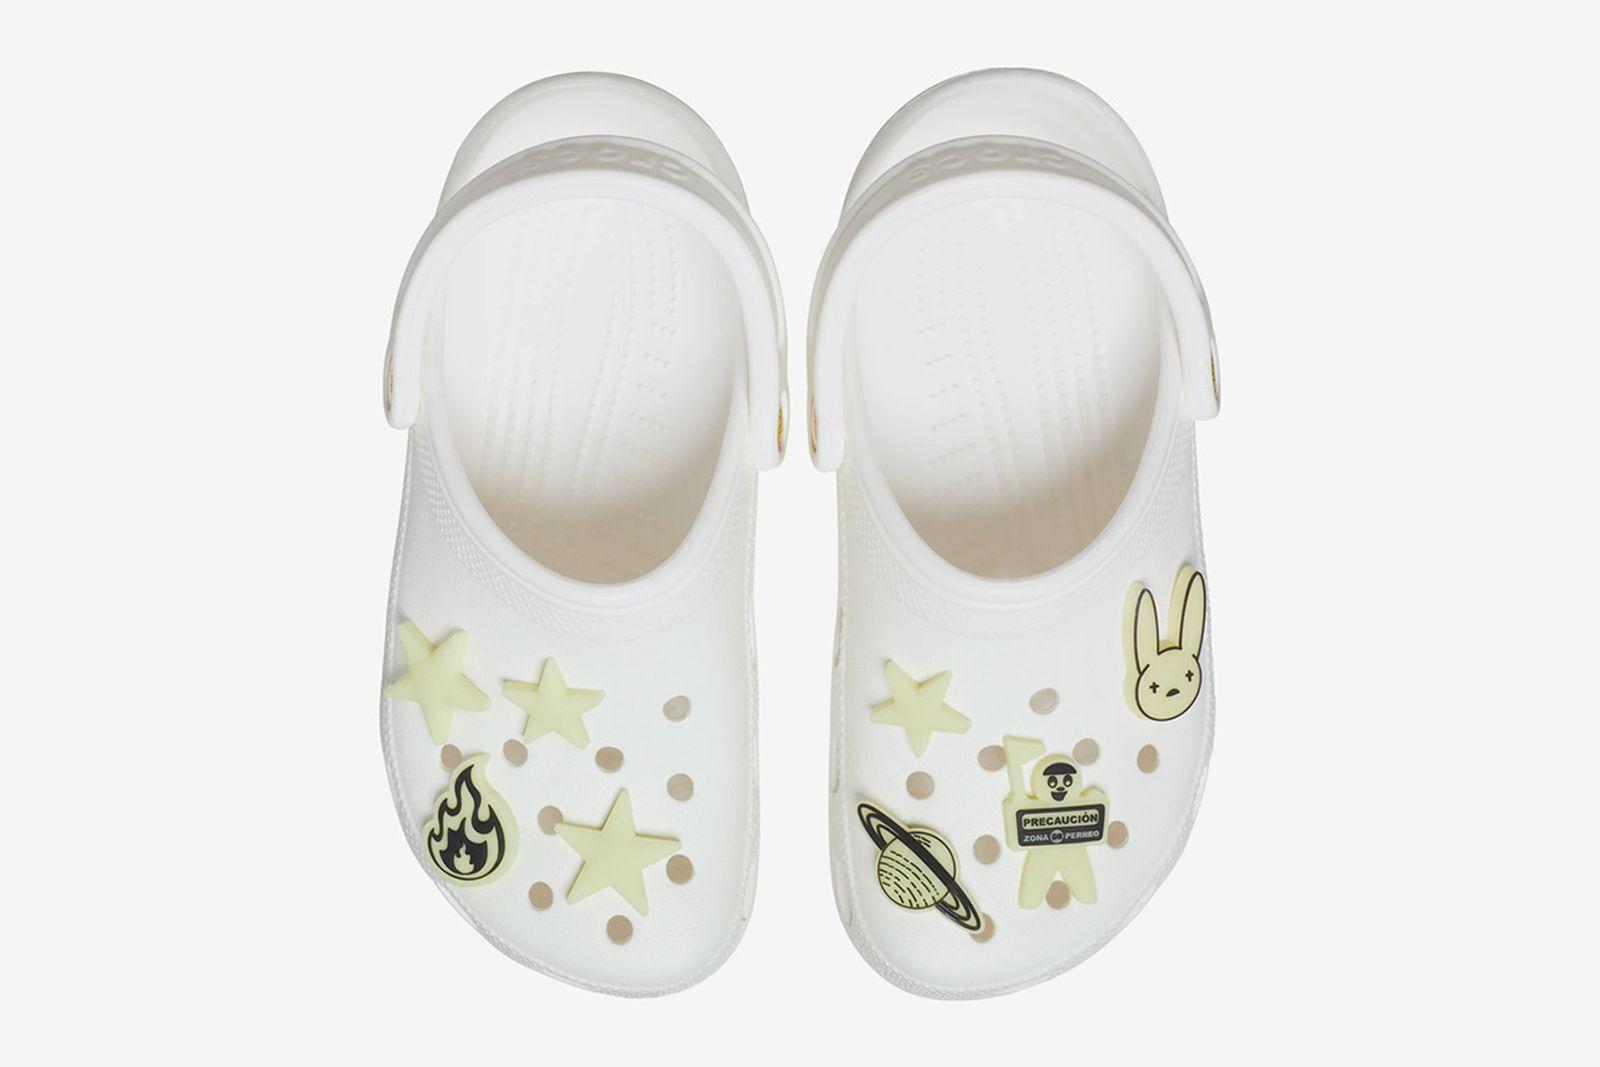 bad-bunny-crocs-clog-release-date-price-02